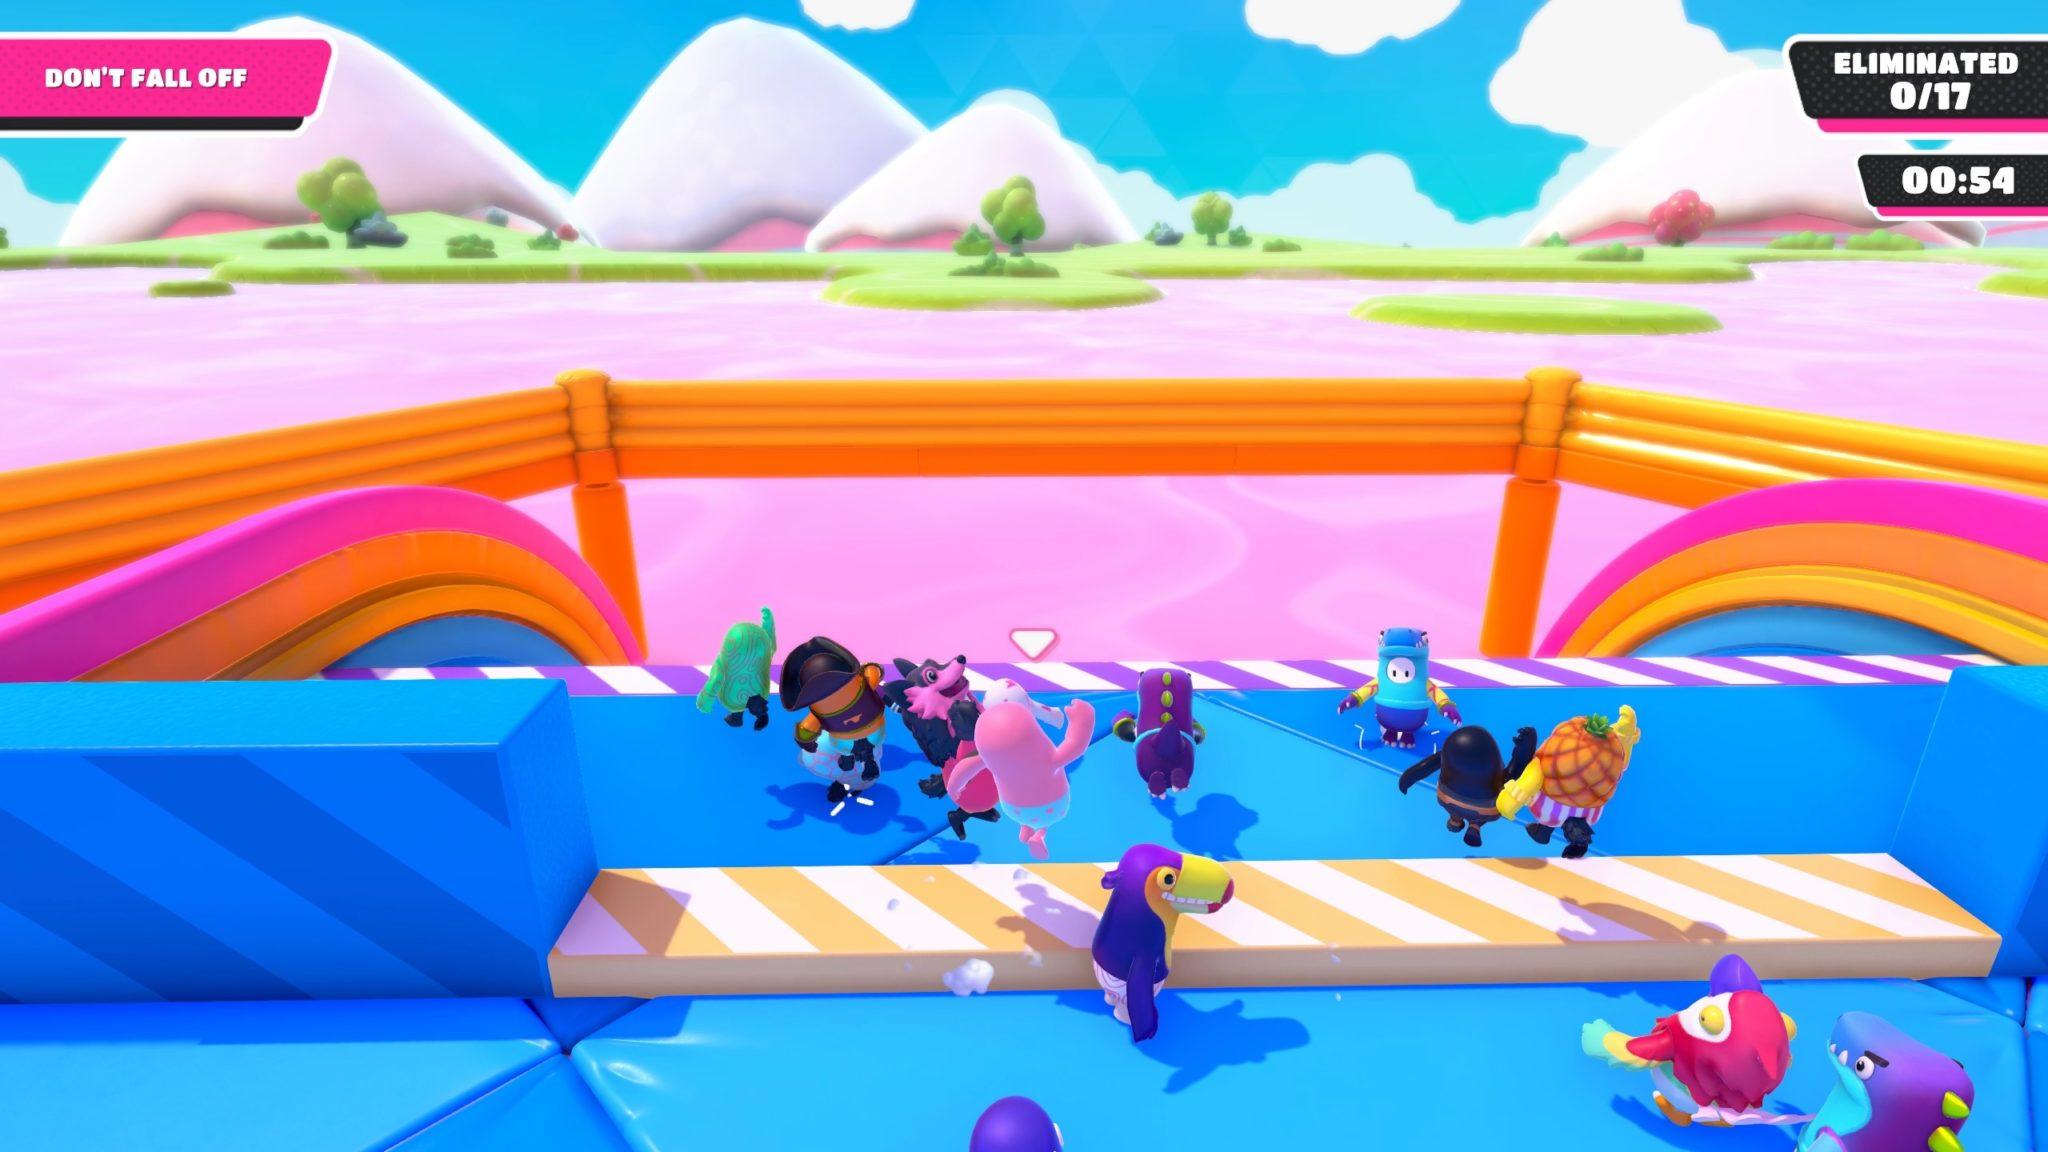 Fall Guys Block Party mini-game